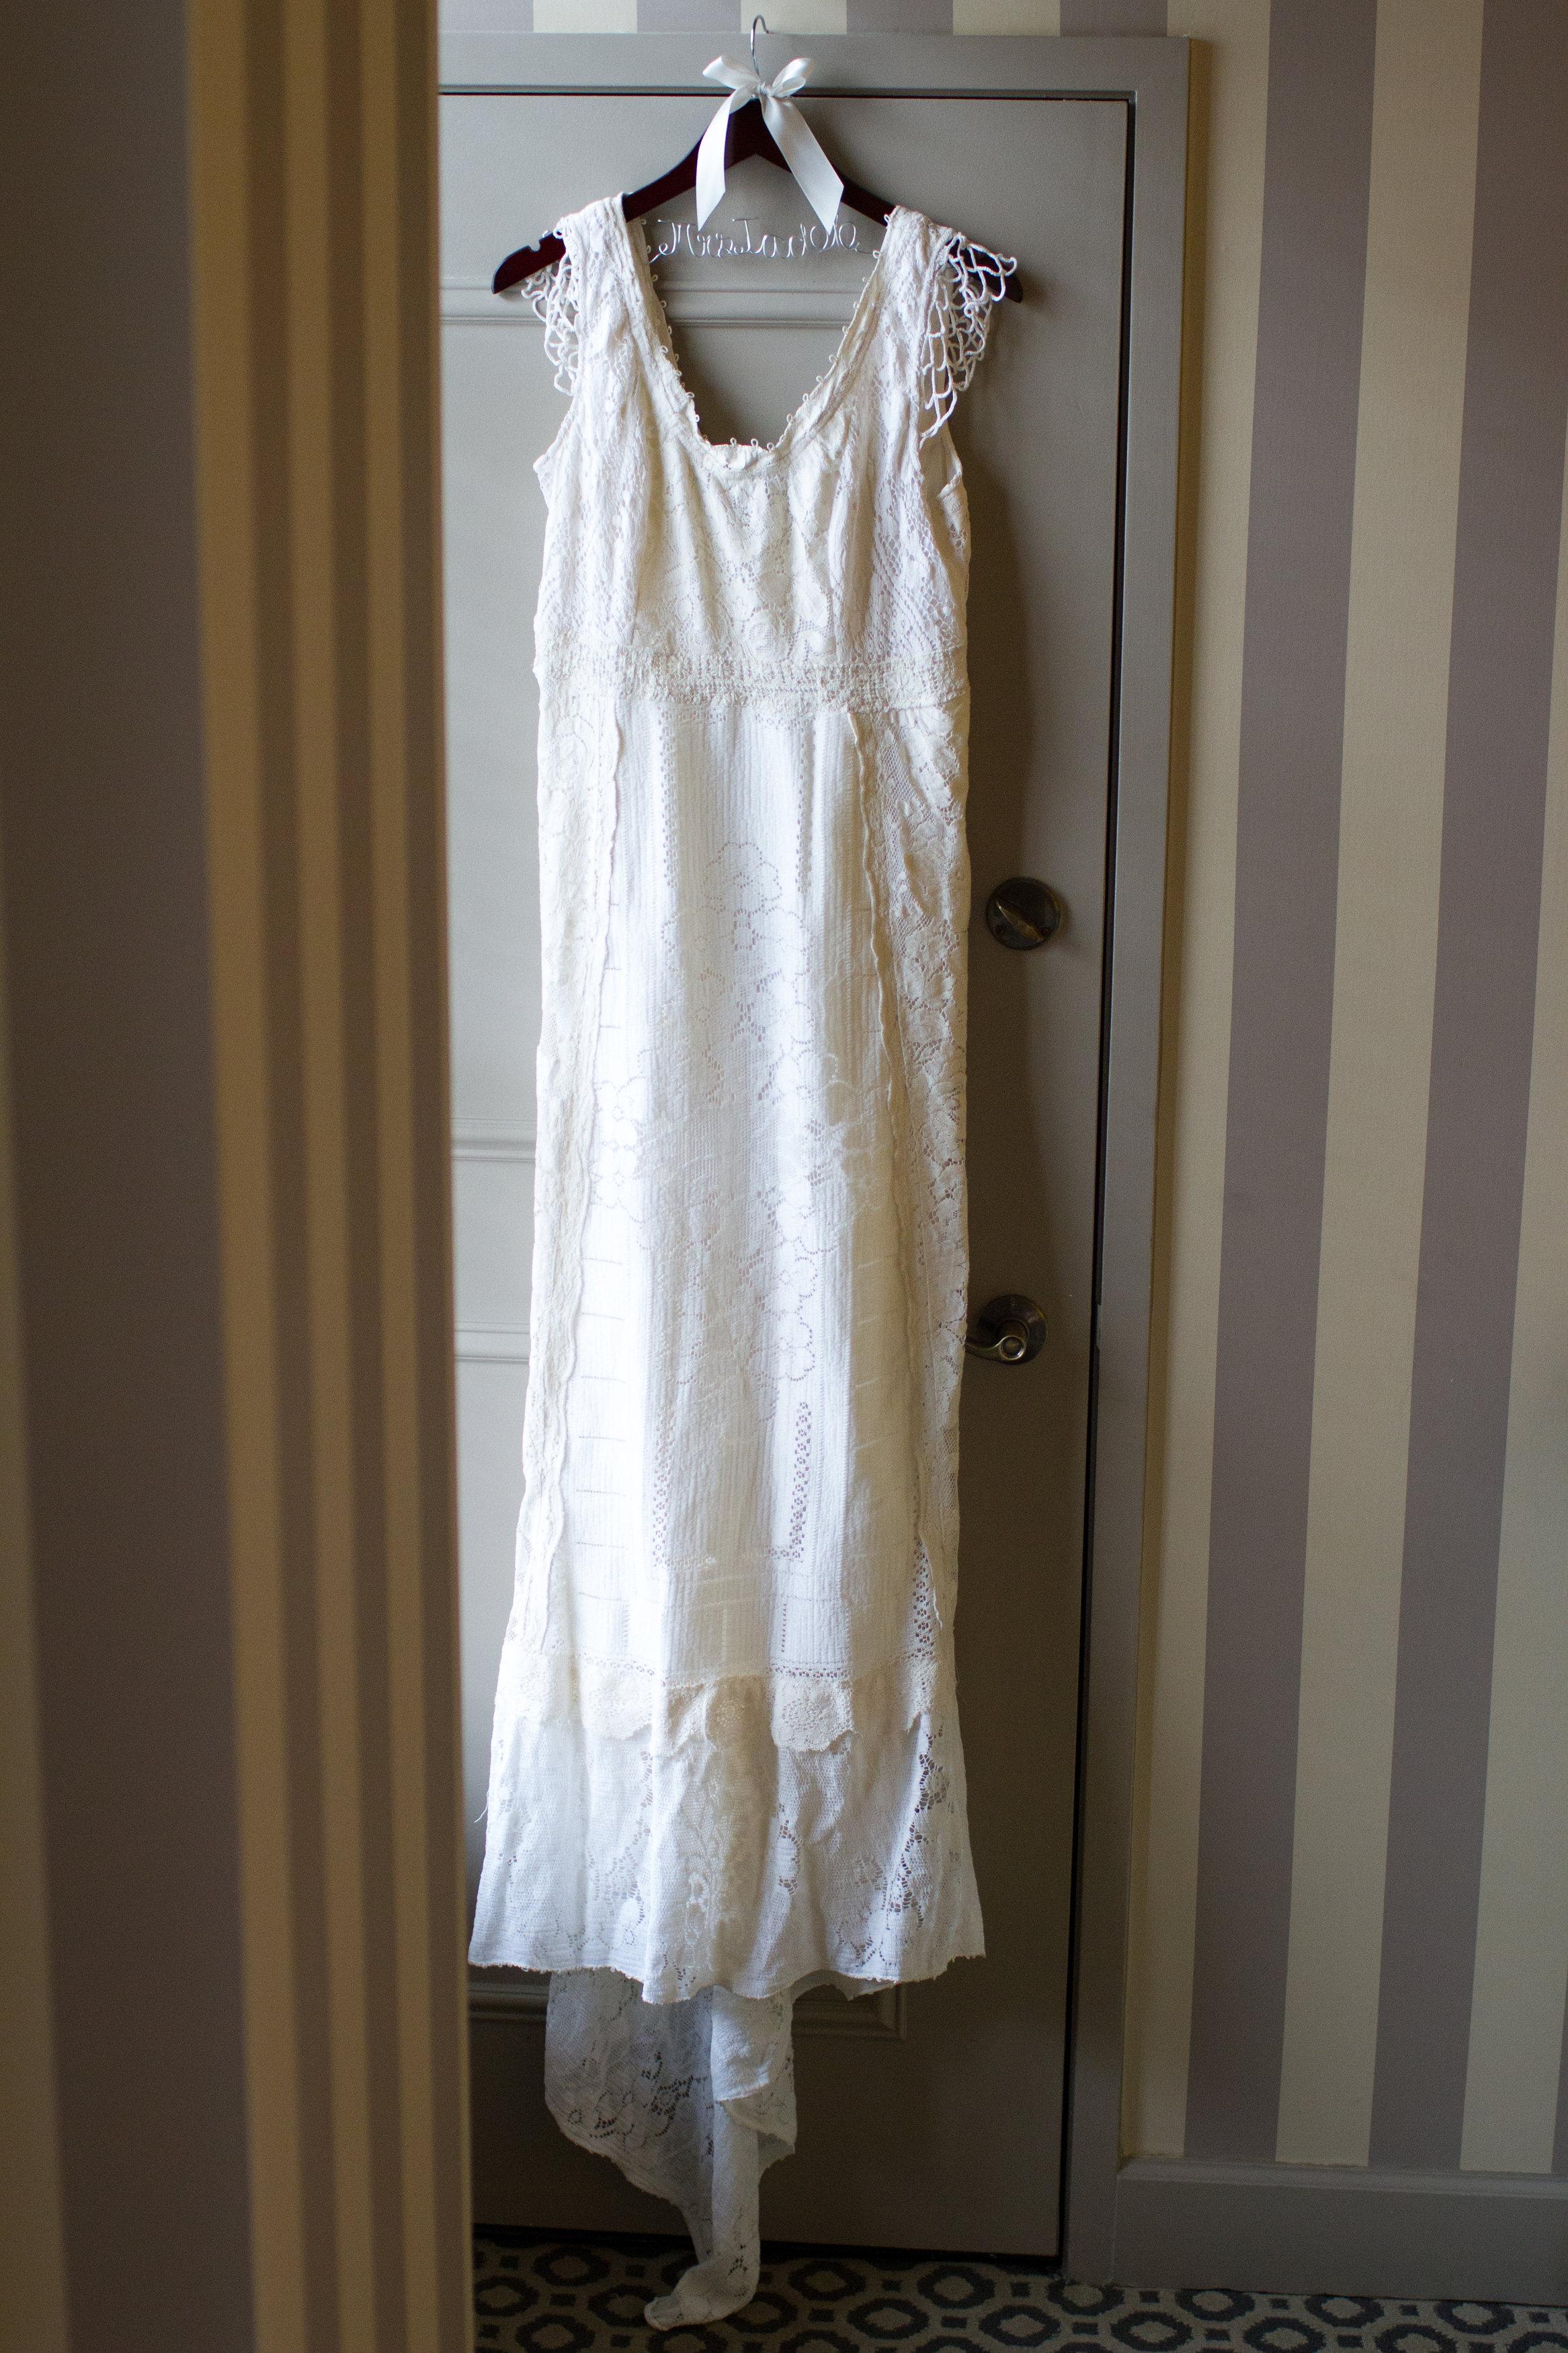 Bridal-dress-with-hanger